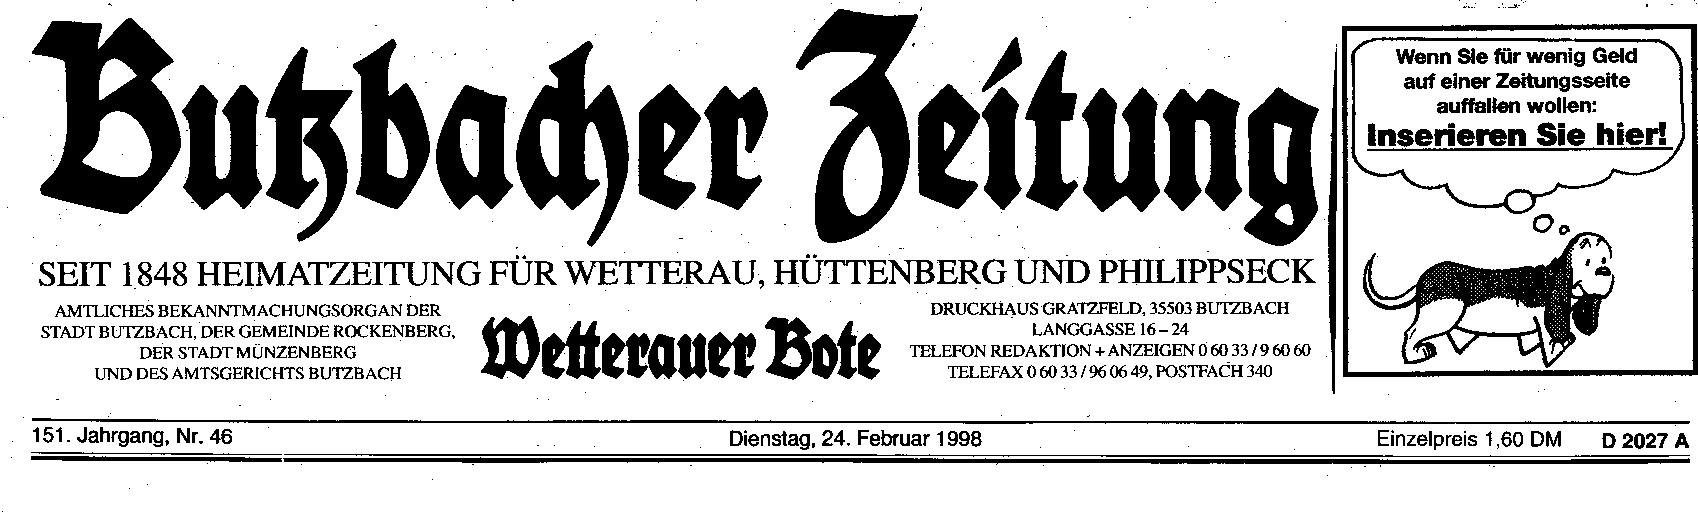 Zeitungskopf_18